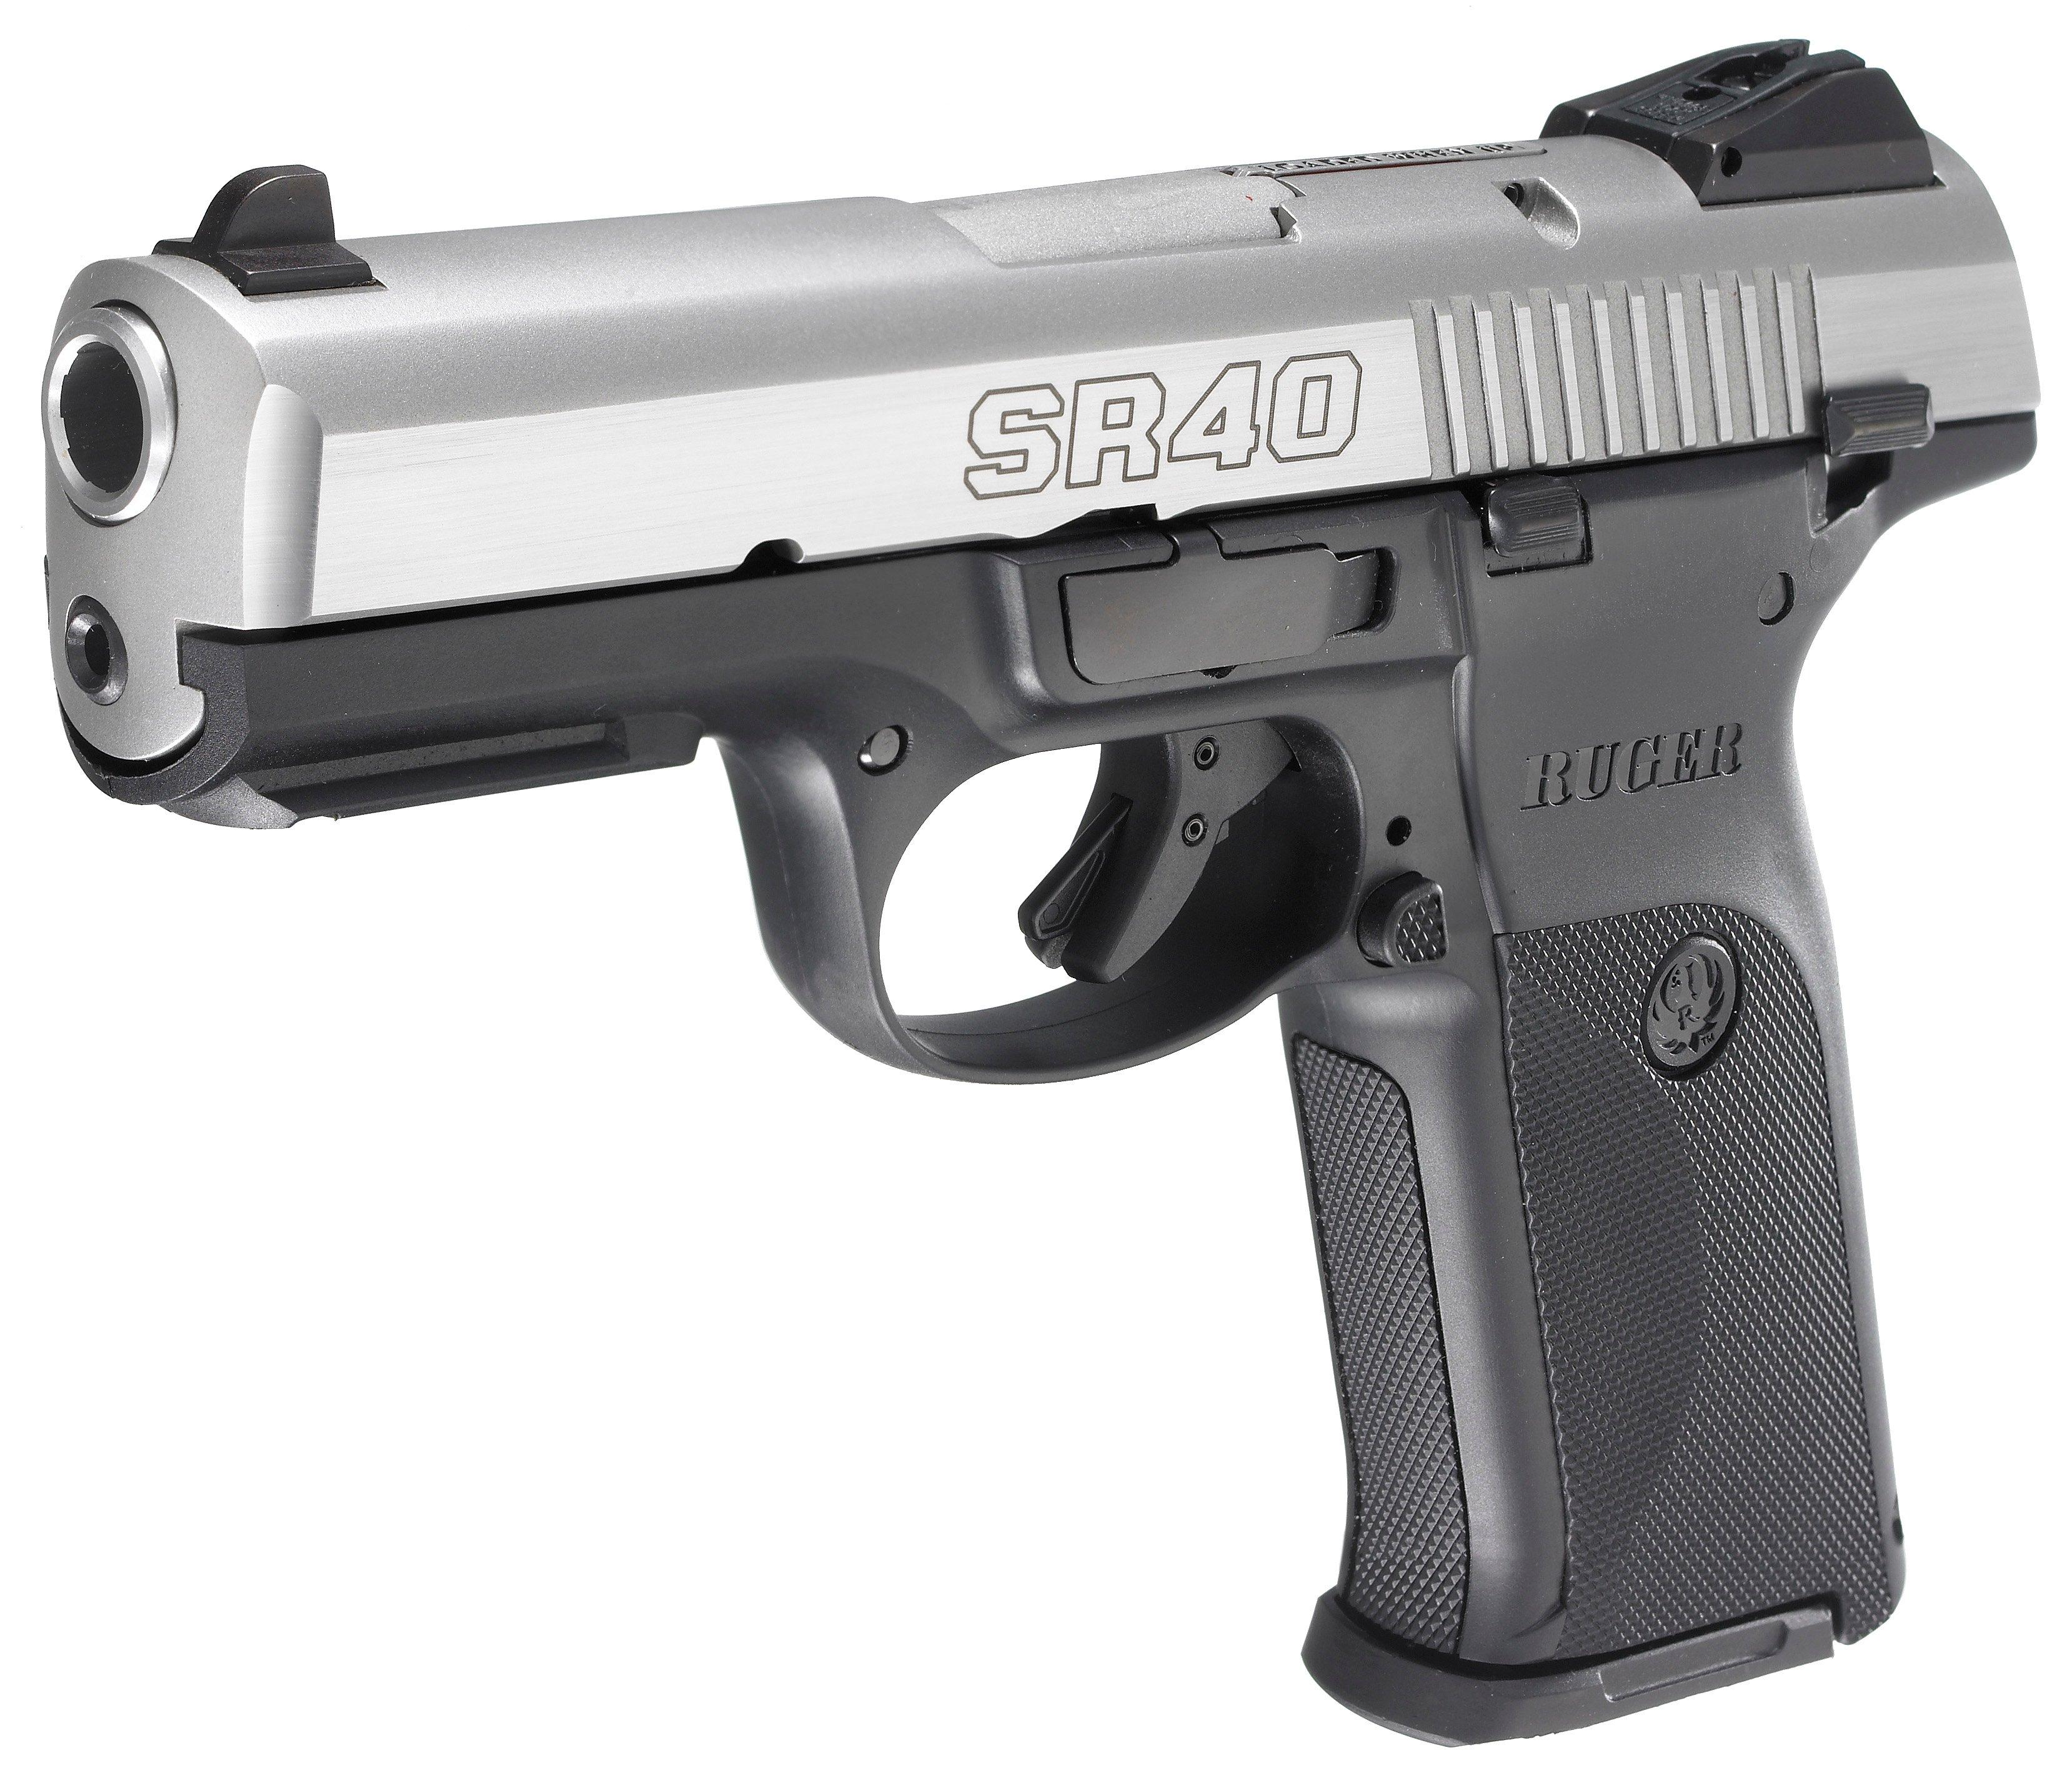 Ruger SR40 Duty Pistol